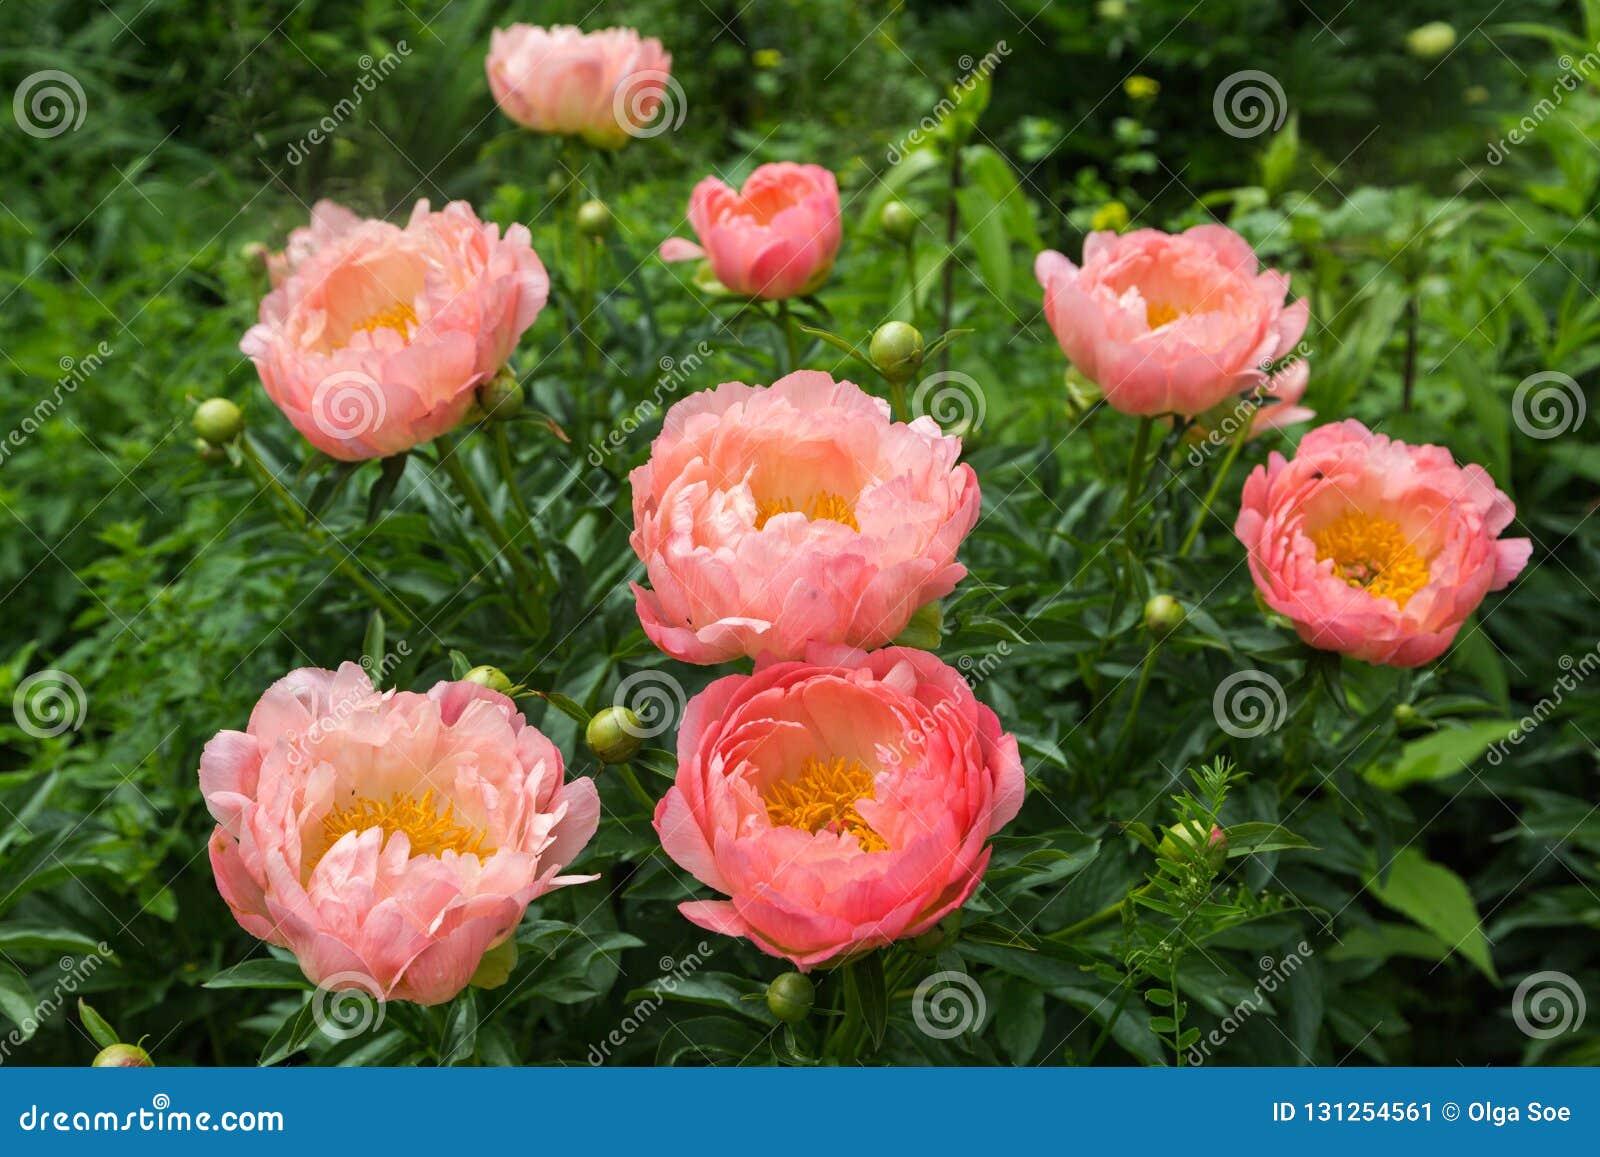 Herbaceous Peonies Pink Hawaiian Coral In Flower Stock Image